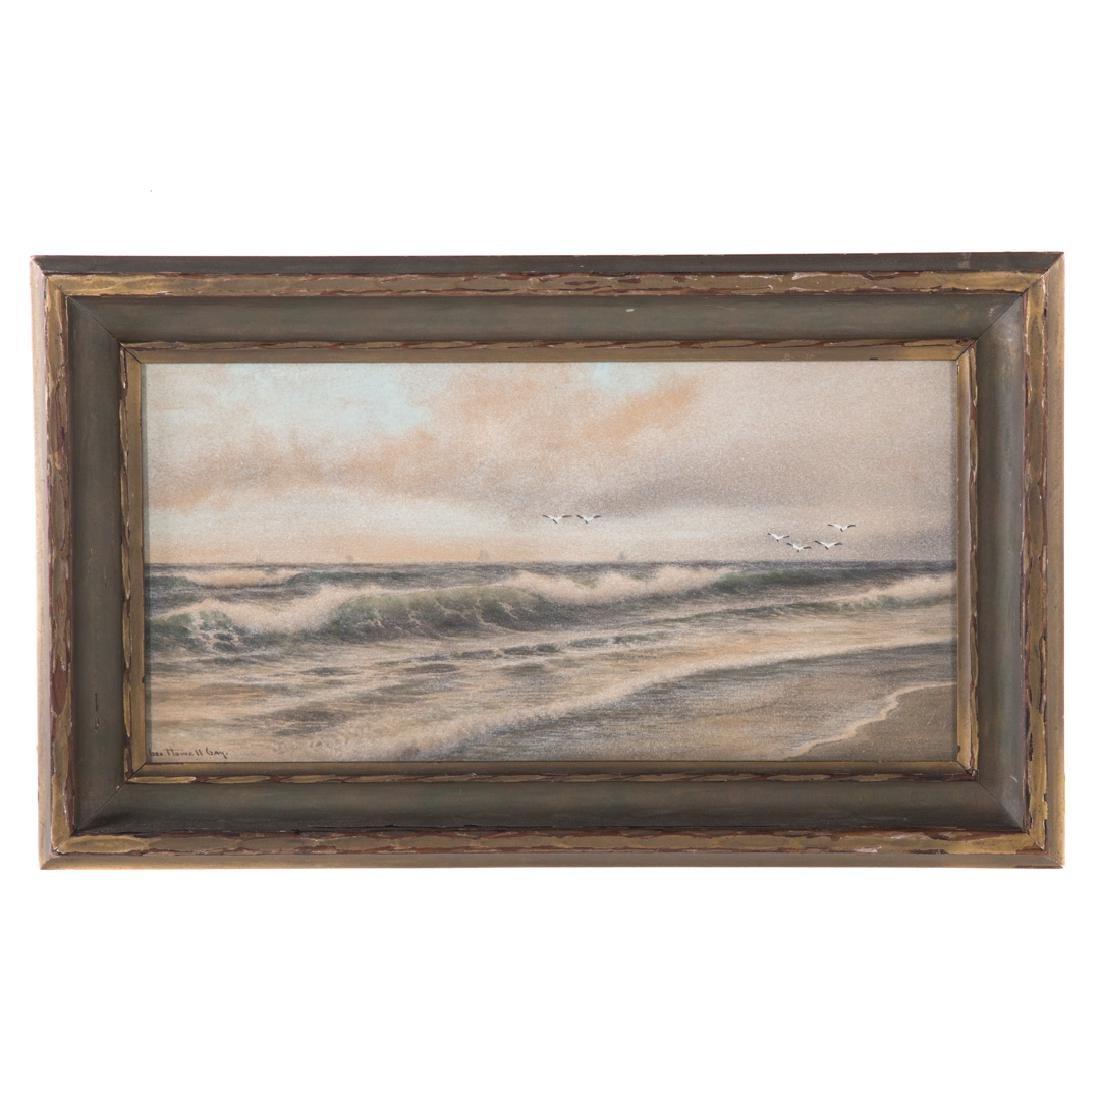 George Howell Gay. Crashing Waves, watercolor